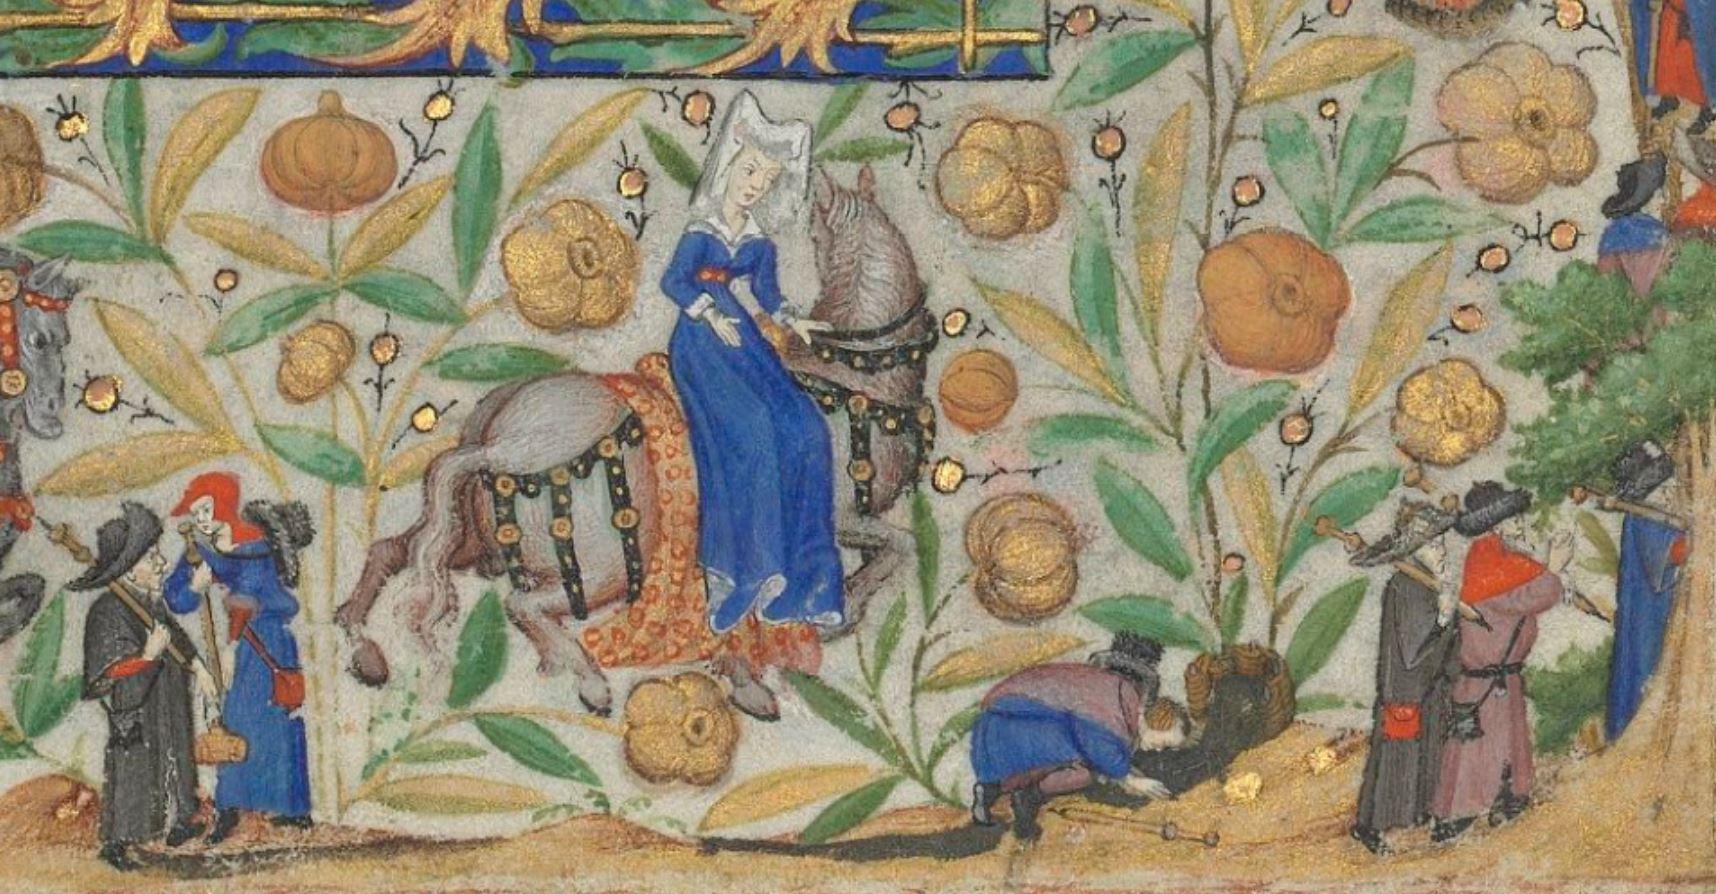 Heures de Marguerite d'Orleans 1430 ca BNF Latin 1156B fol 25r Gallica detail